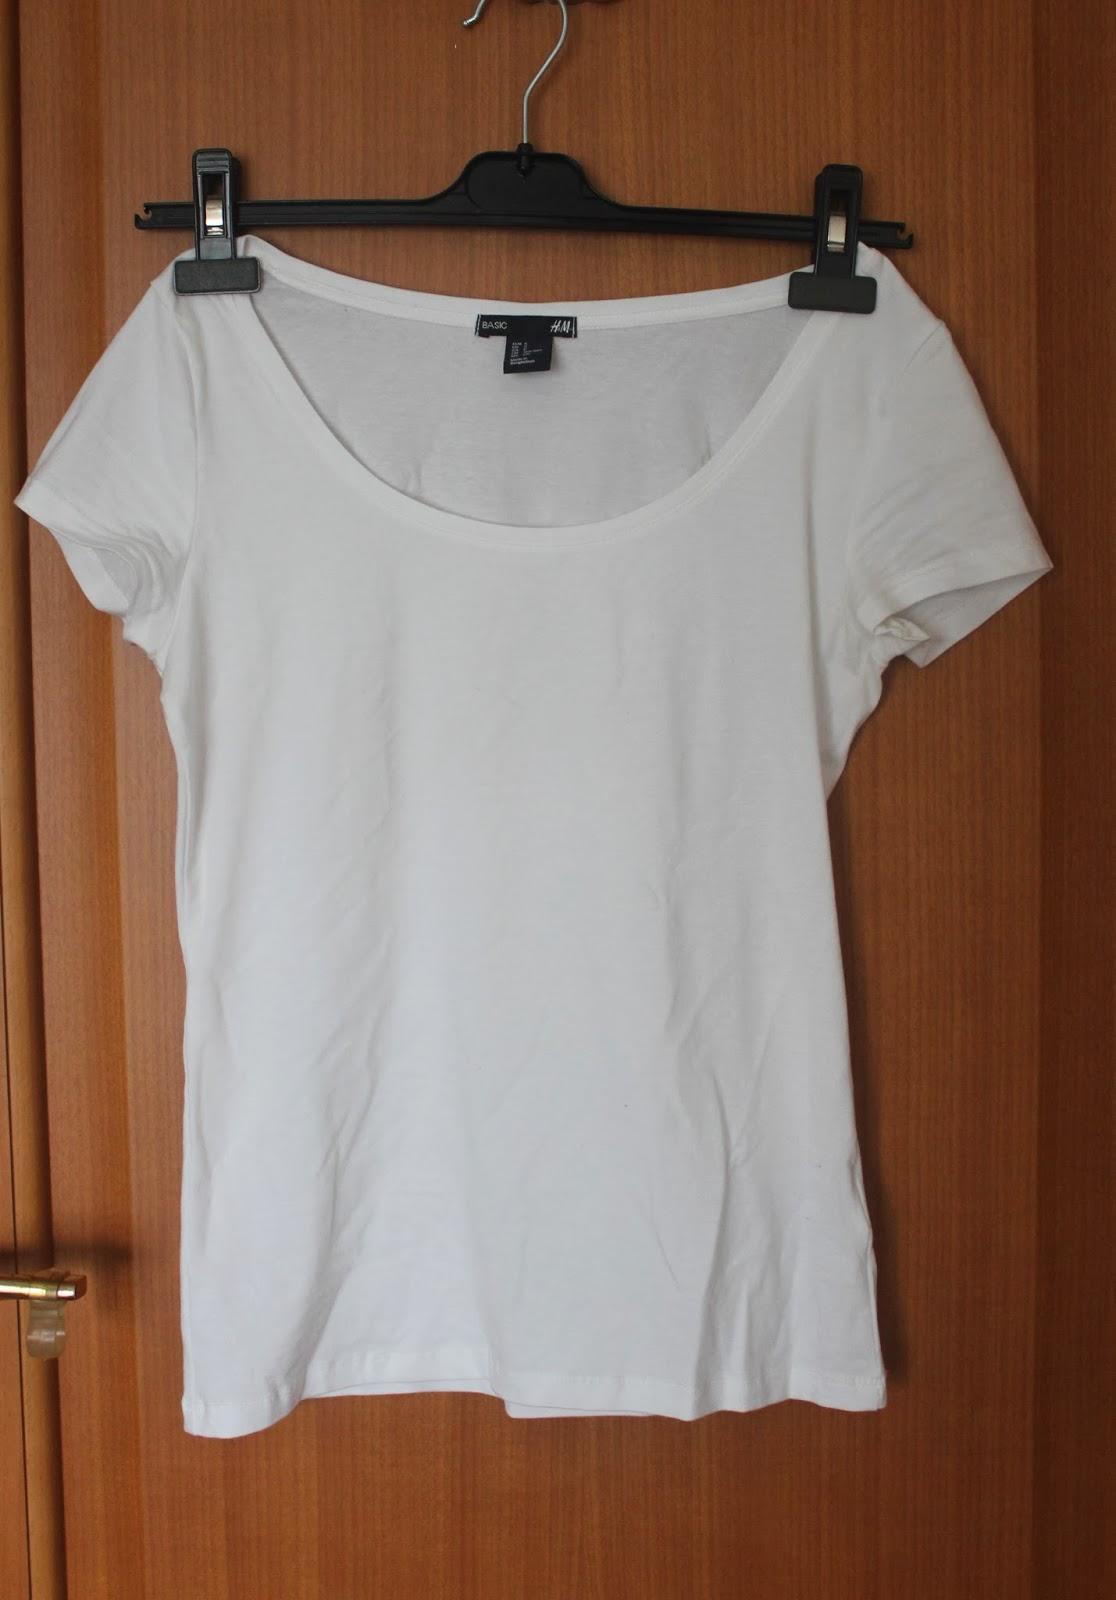 hm beyaz tshirt